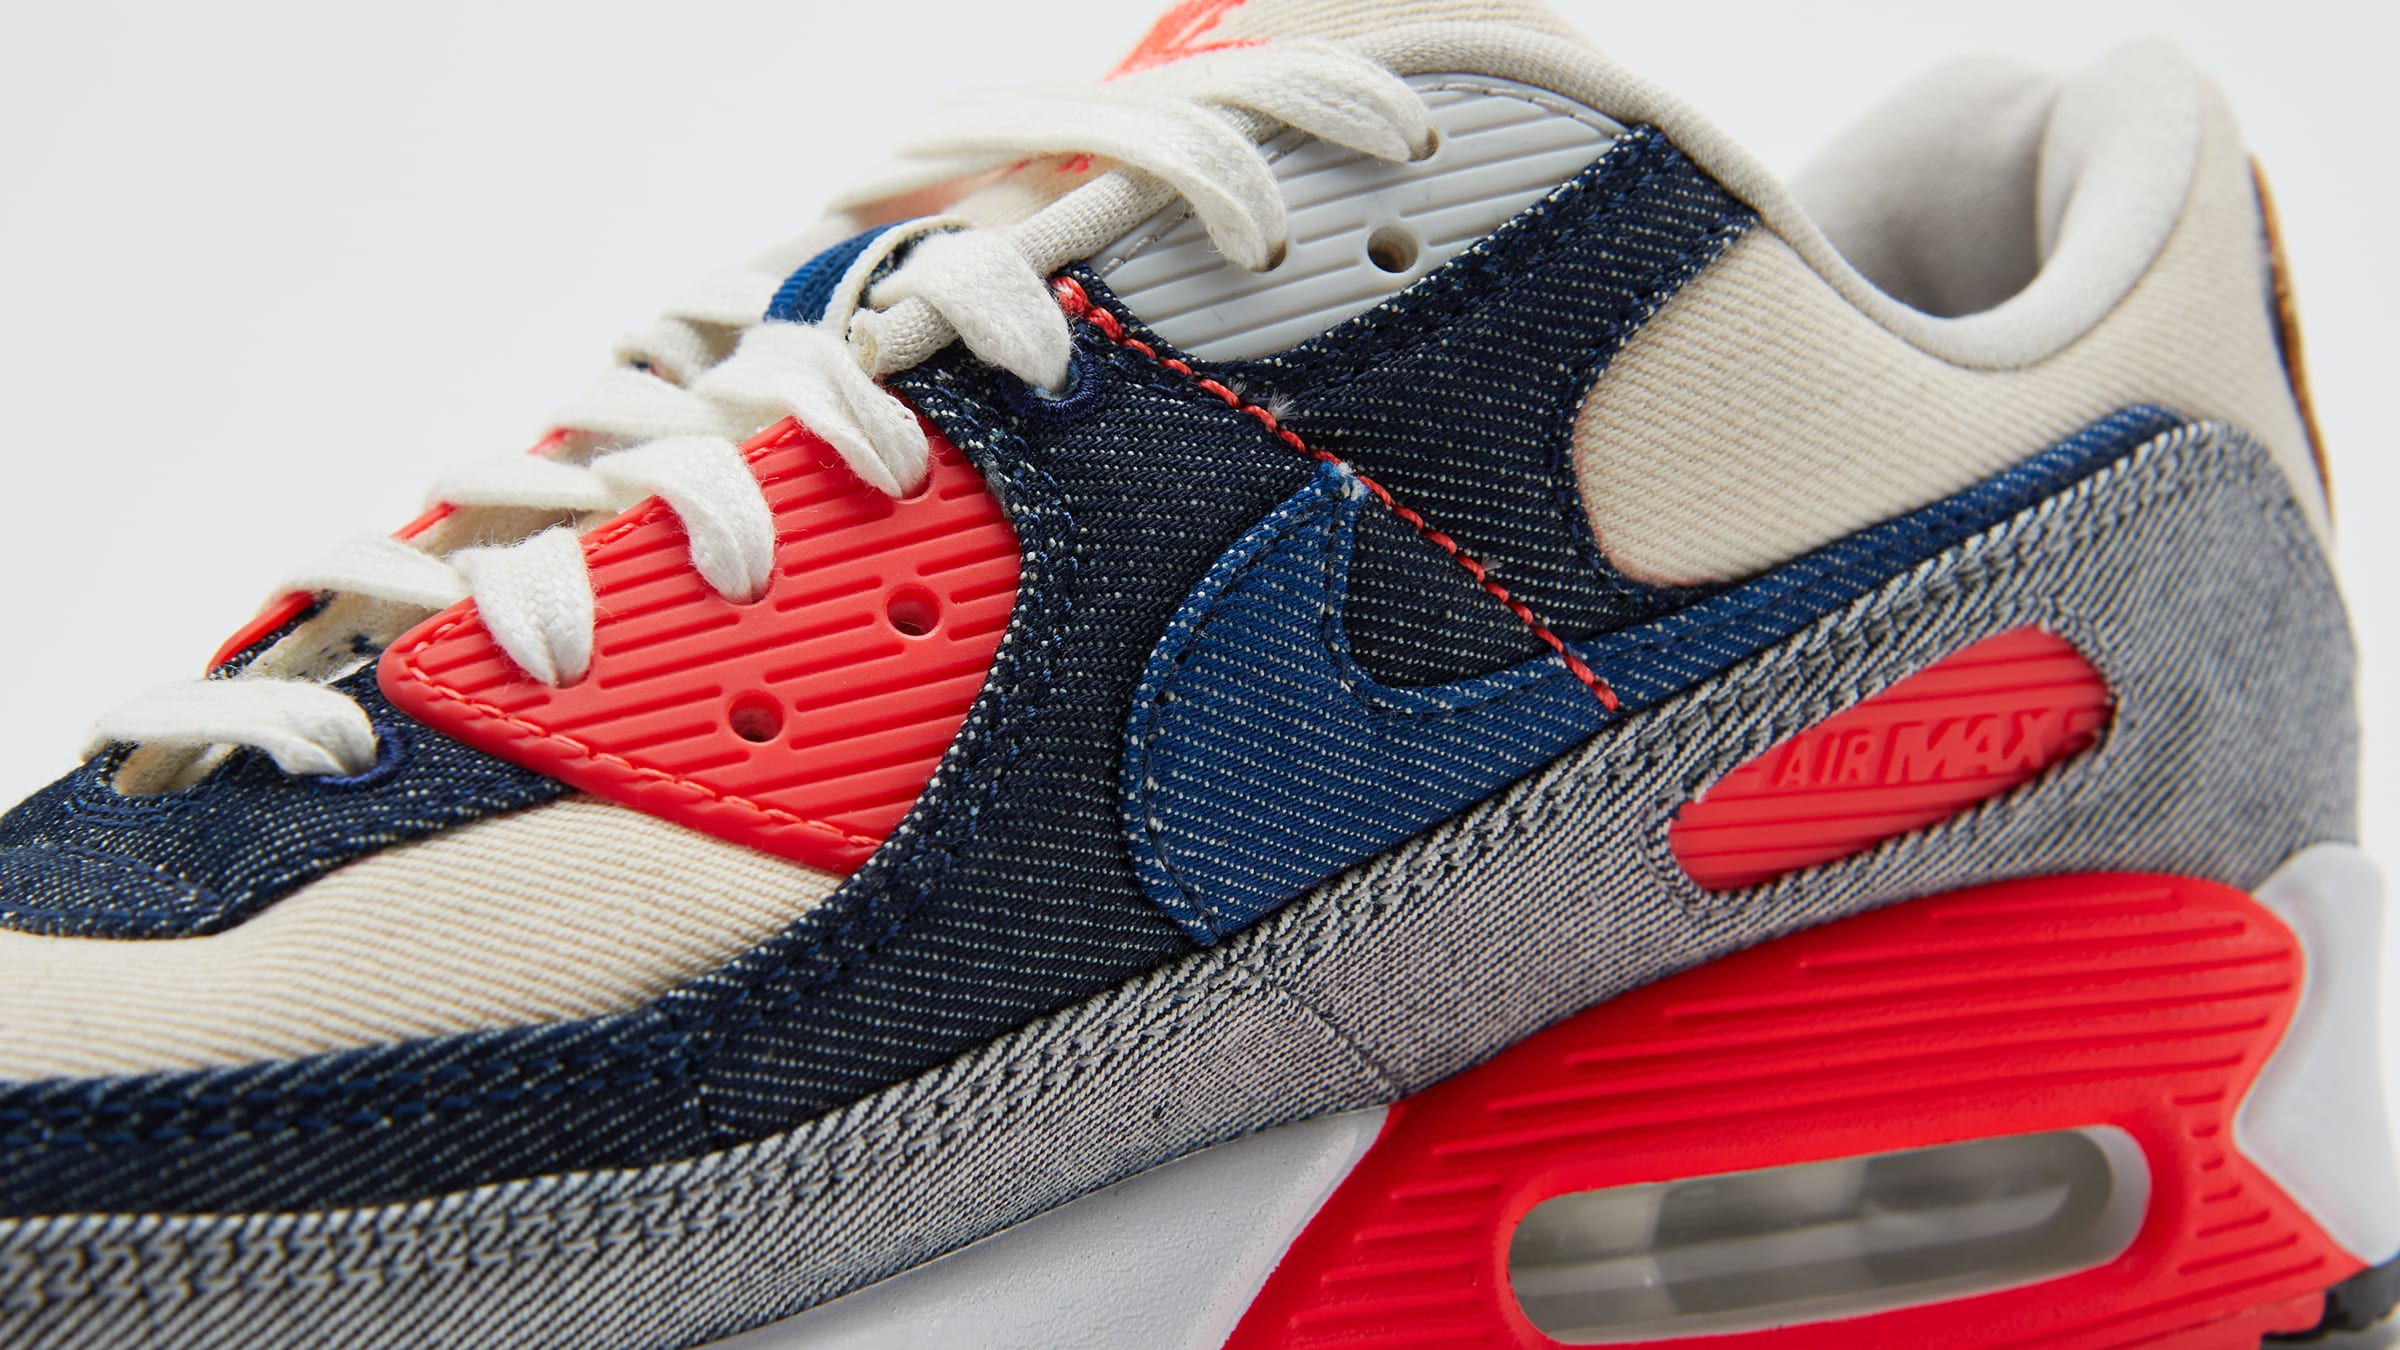 Denham x Nike Air Max 90 Medial